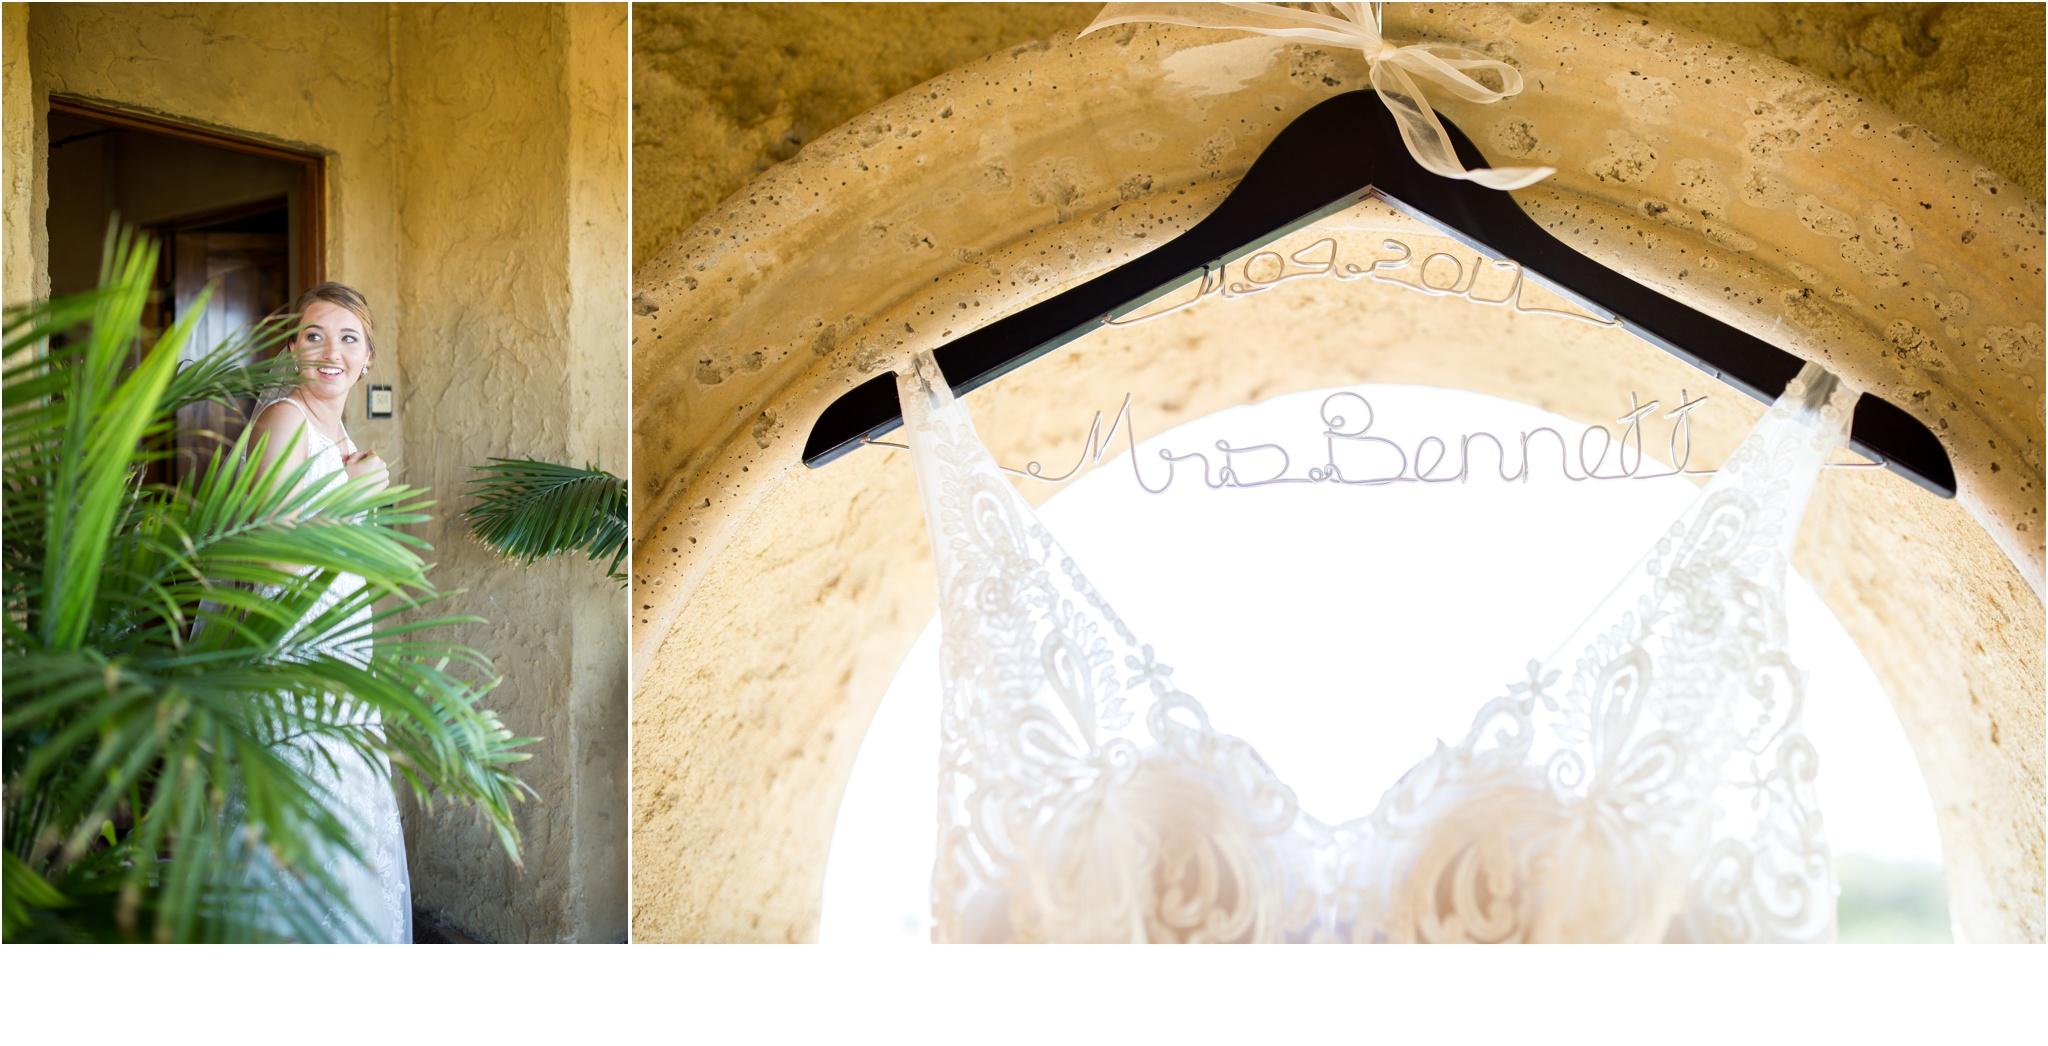 Rainey_Gregg_Photography_St._Simons_Island_Georgia_California_Wedding_Portrait_Photography_0639.jpg